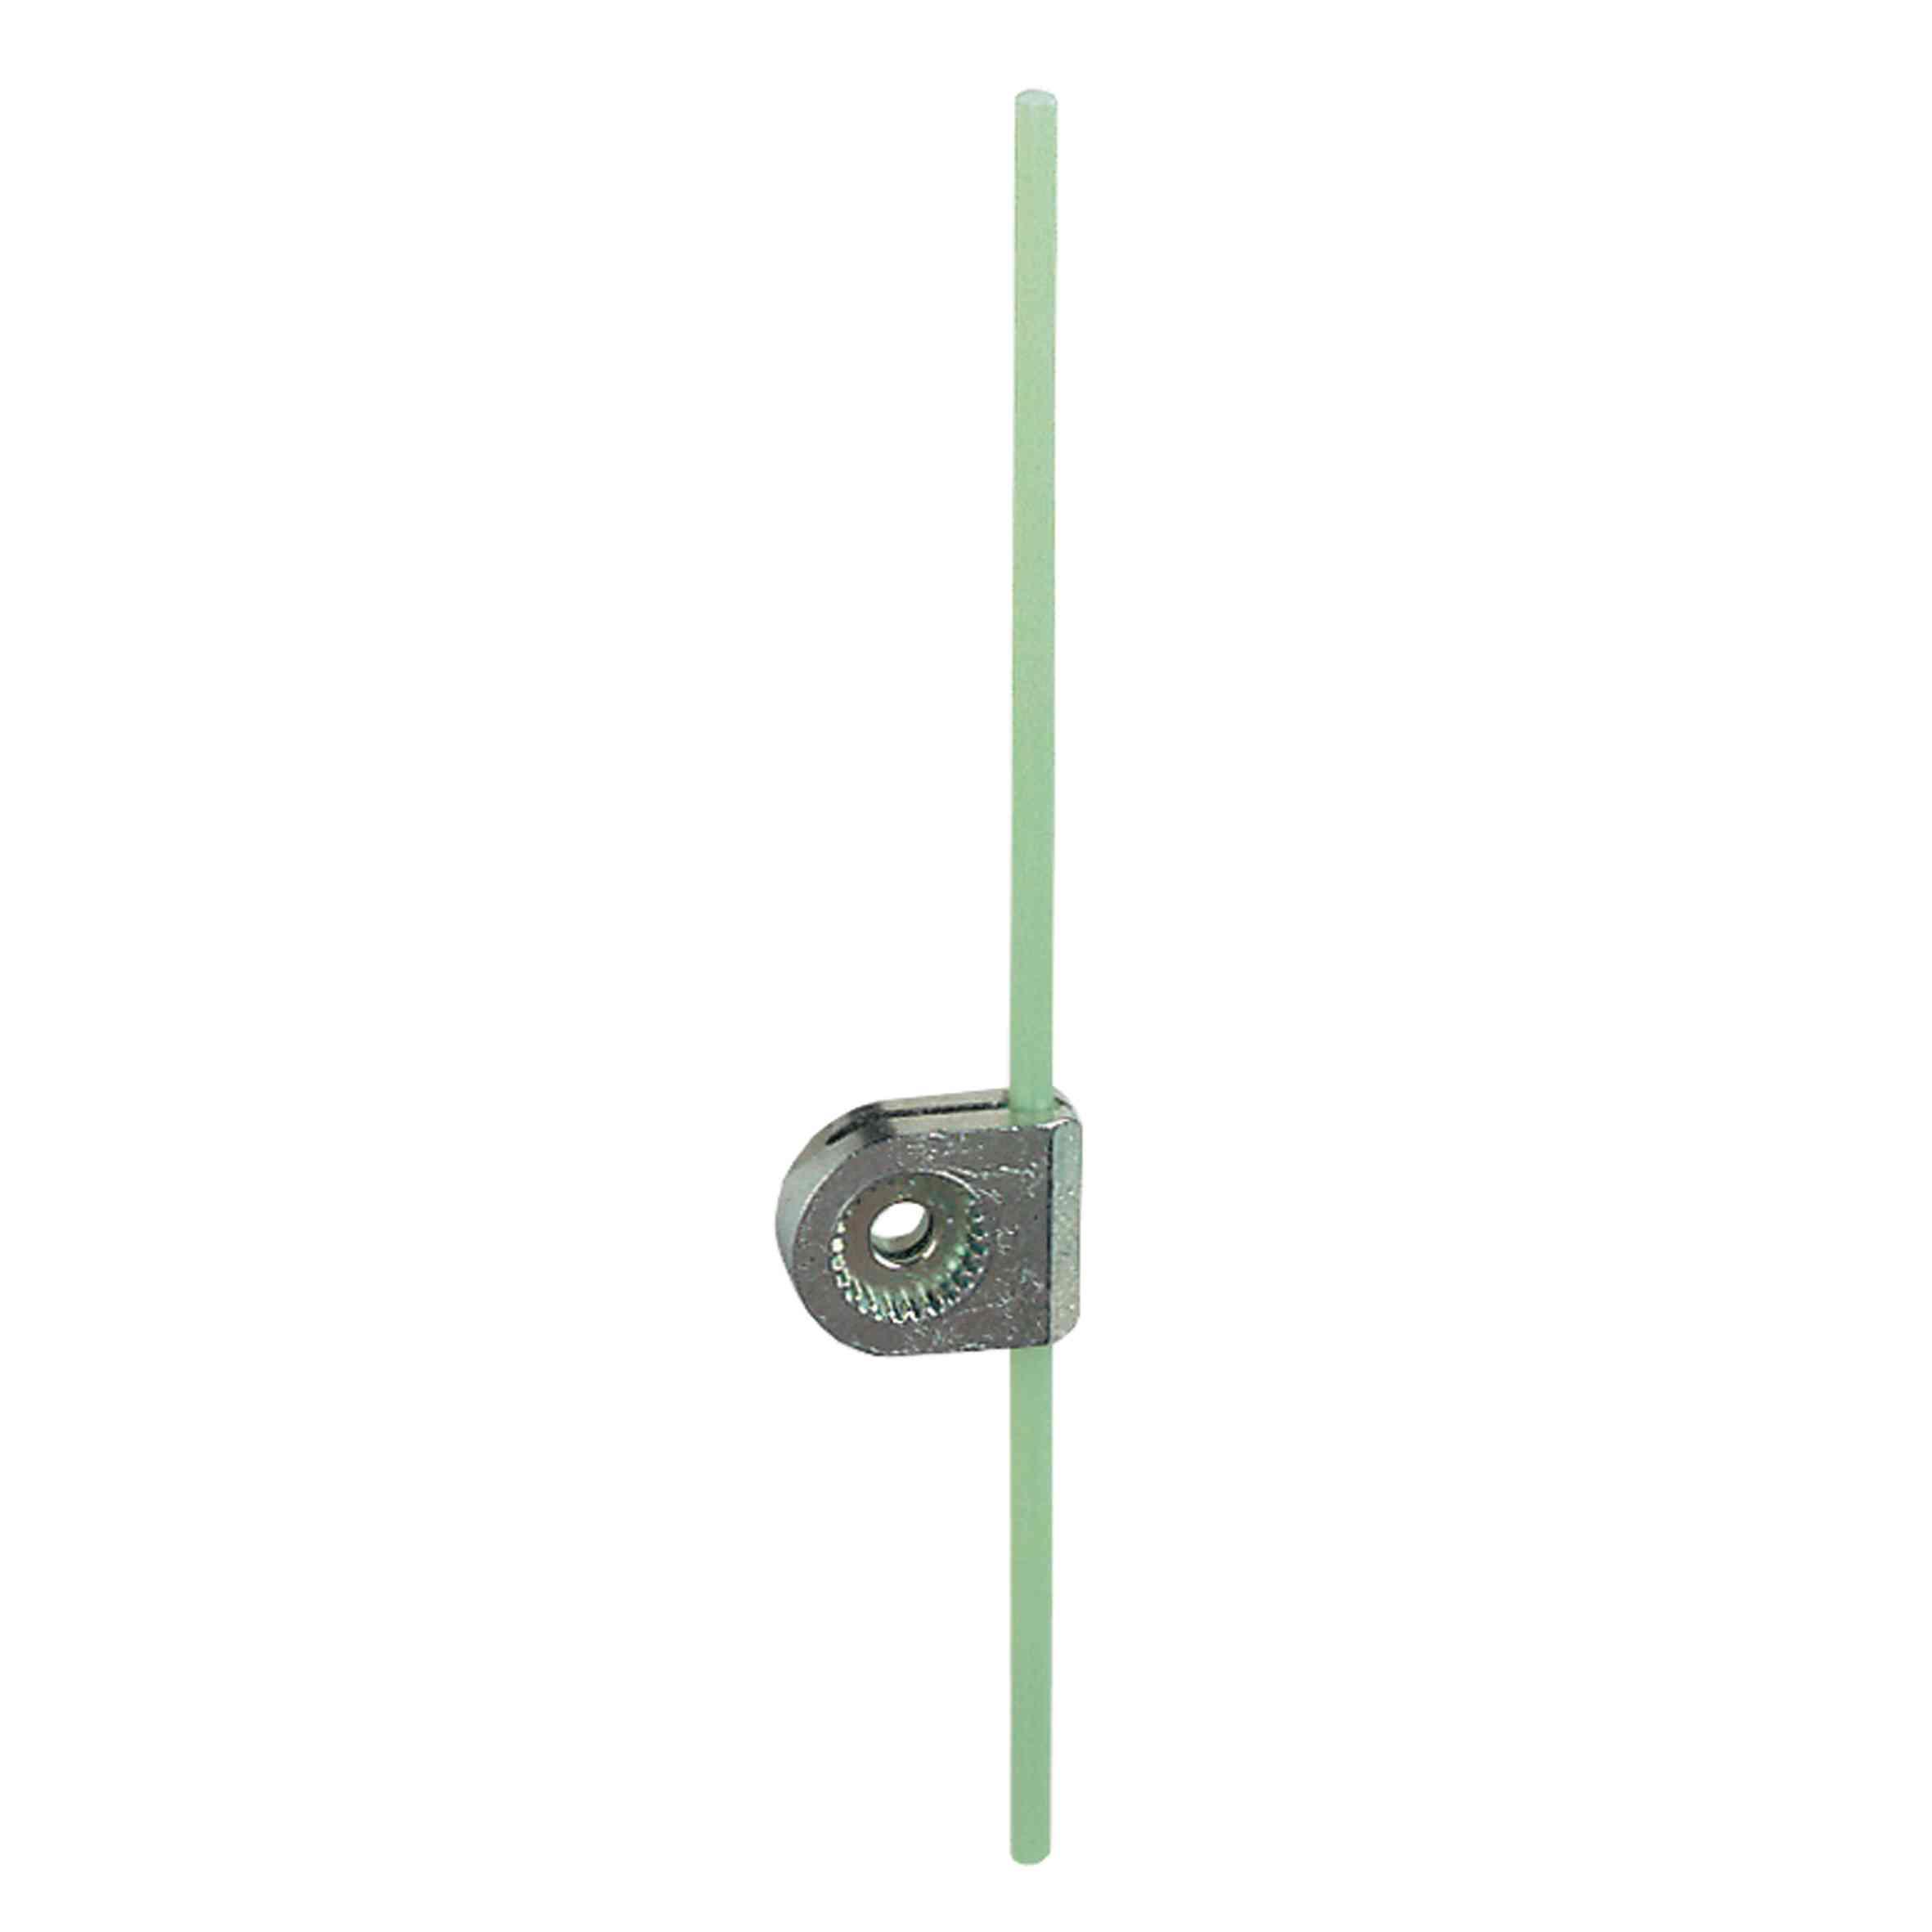 Vzvod omej. stik. ZCY - vzvod s termoplast. okroglo palico, 6 mm, D = 200 mm